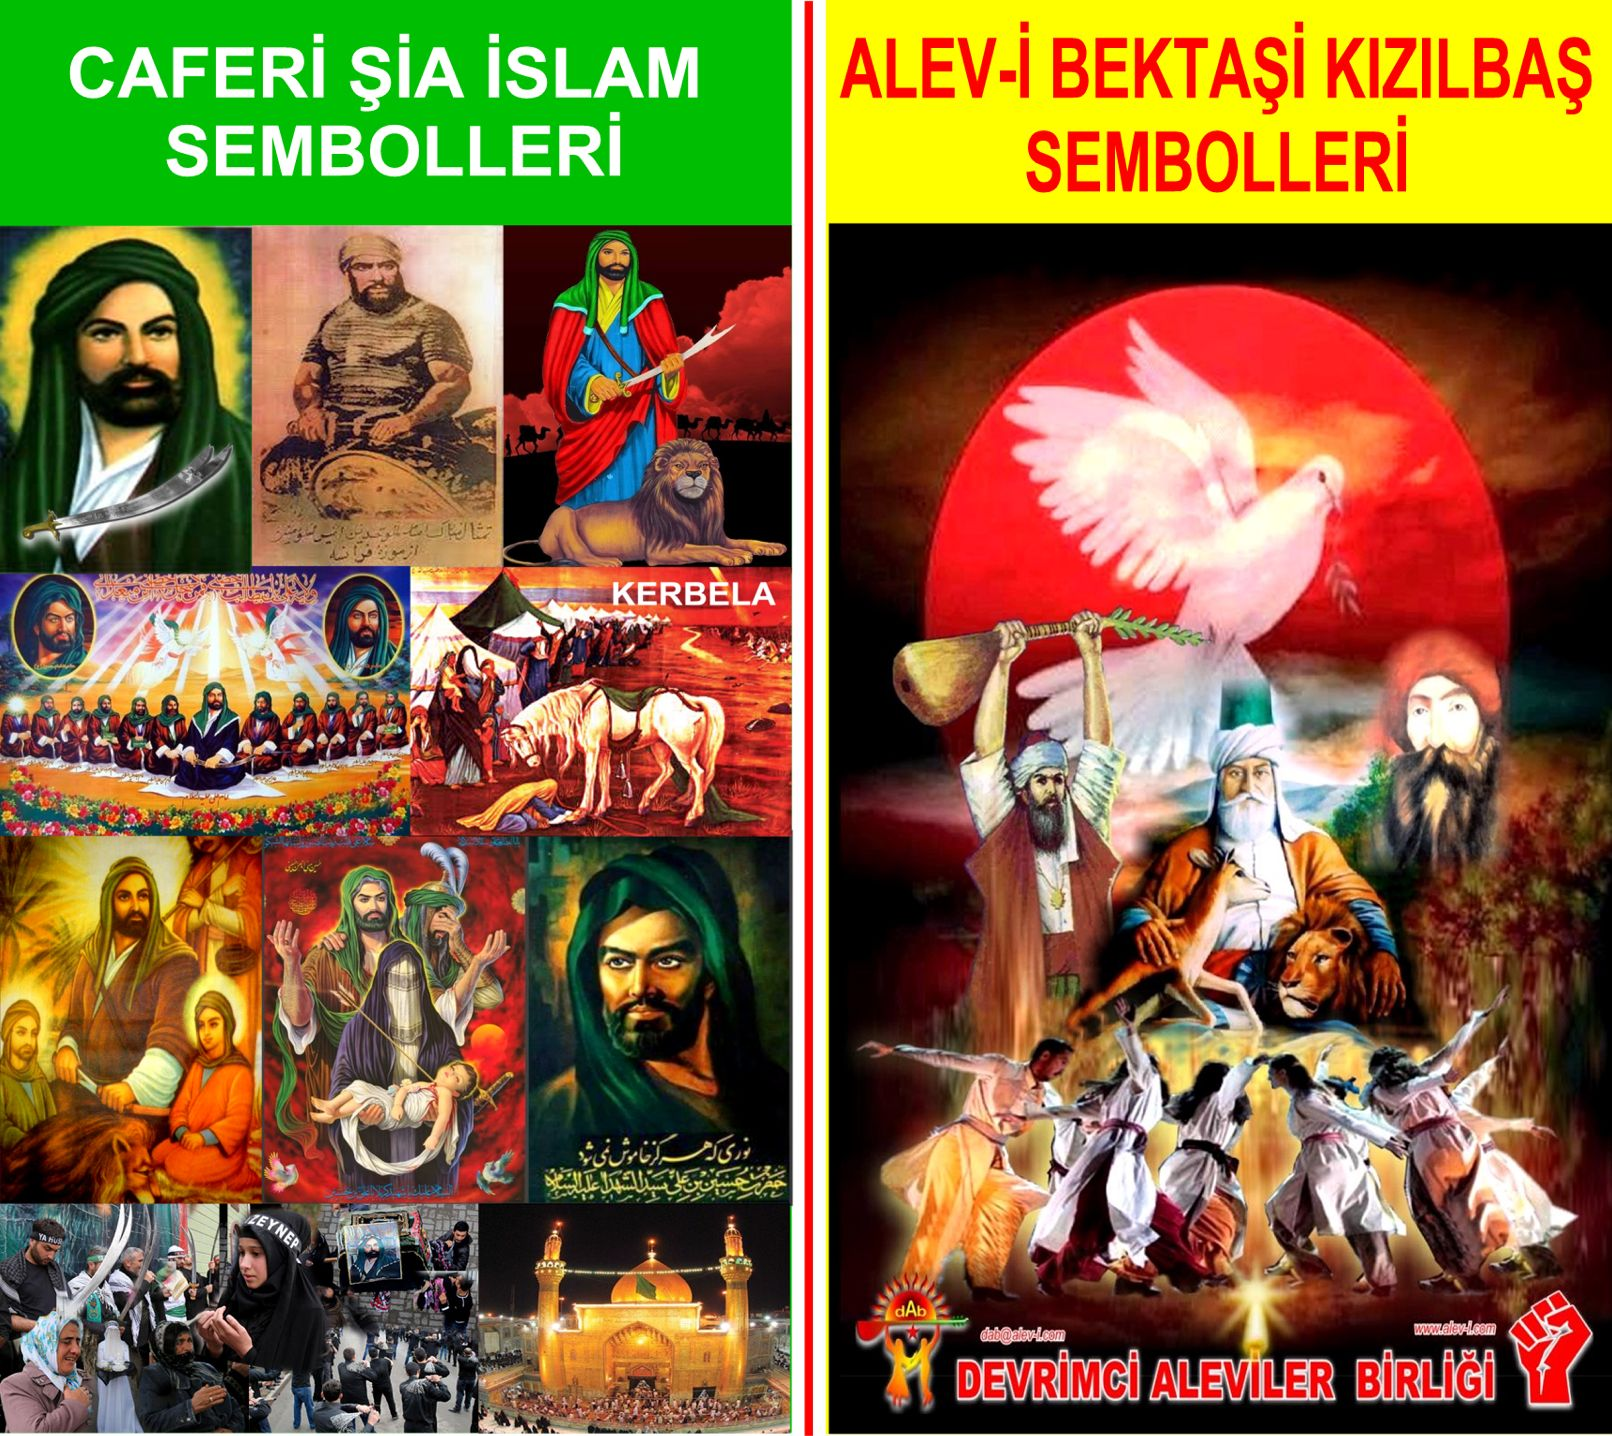 1 Hz imam Ali divani Alevi bektasi kizilbas pir sultan devrimci aleviler birligi DAB Feramuz Sah Acar alevi bektasi ve sia islam sembol